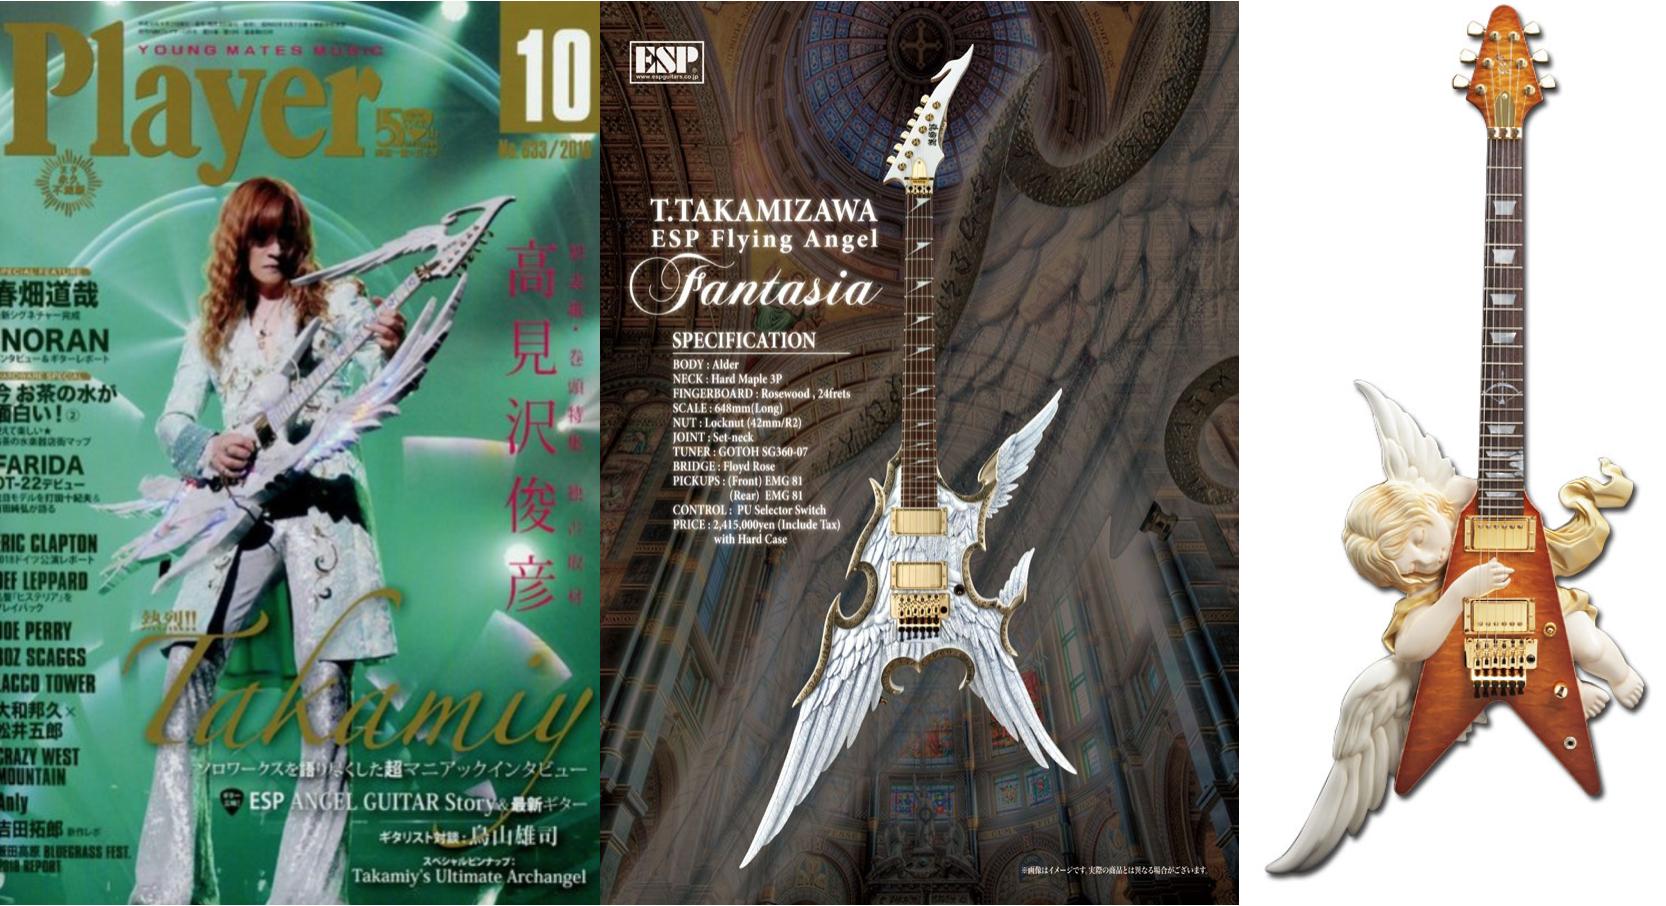 Las ESP de Toshihiko Takamizawa  Ultimate Archangel, Flying Angel y Angel Classic V